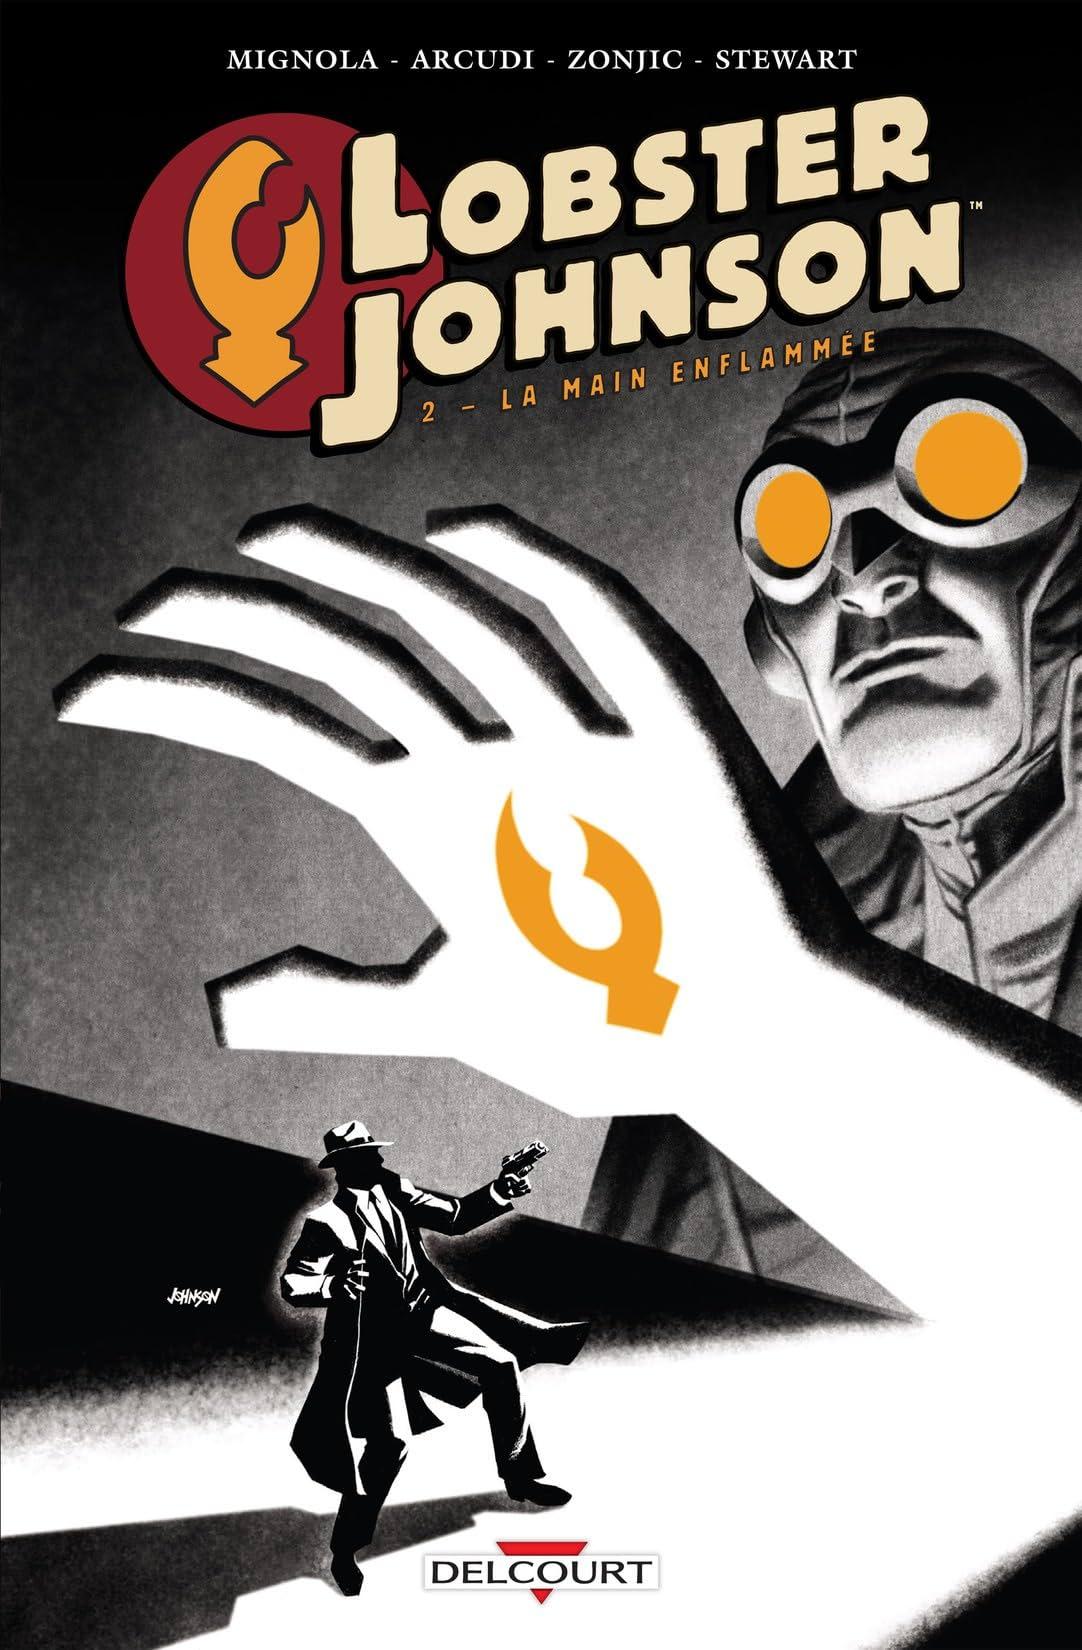 Lobster Johnson Vol. 2: La main enflammée